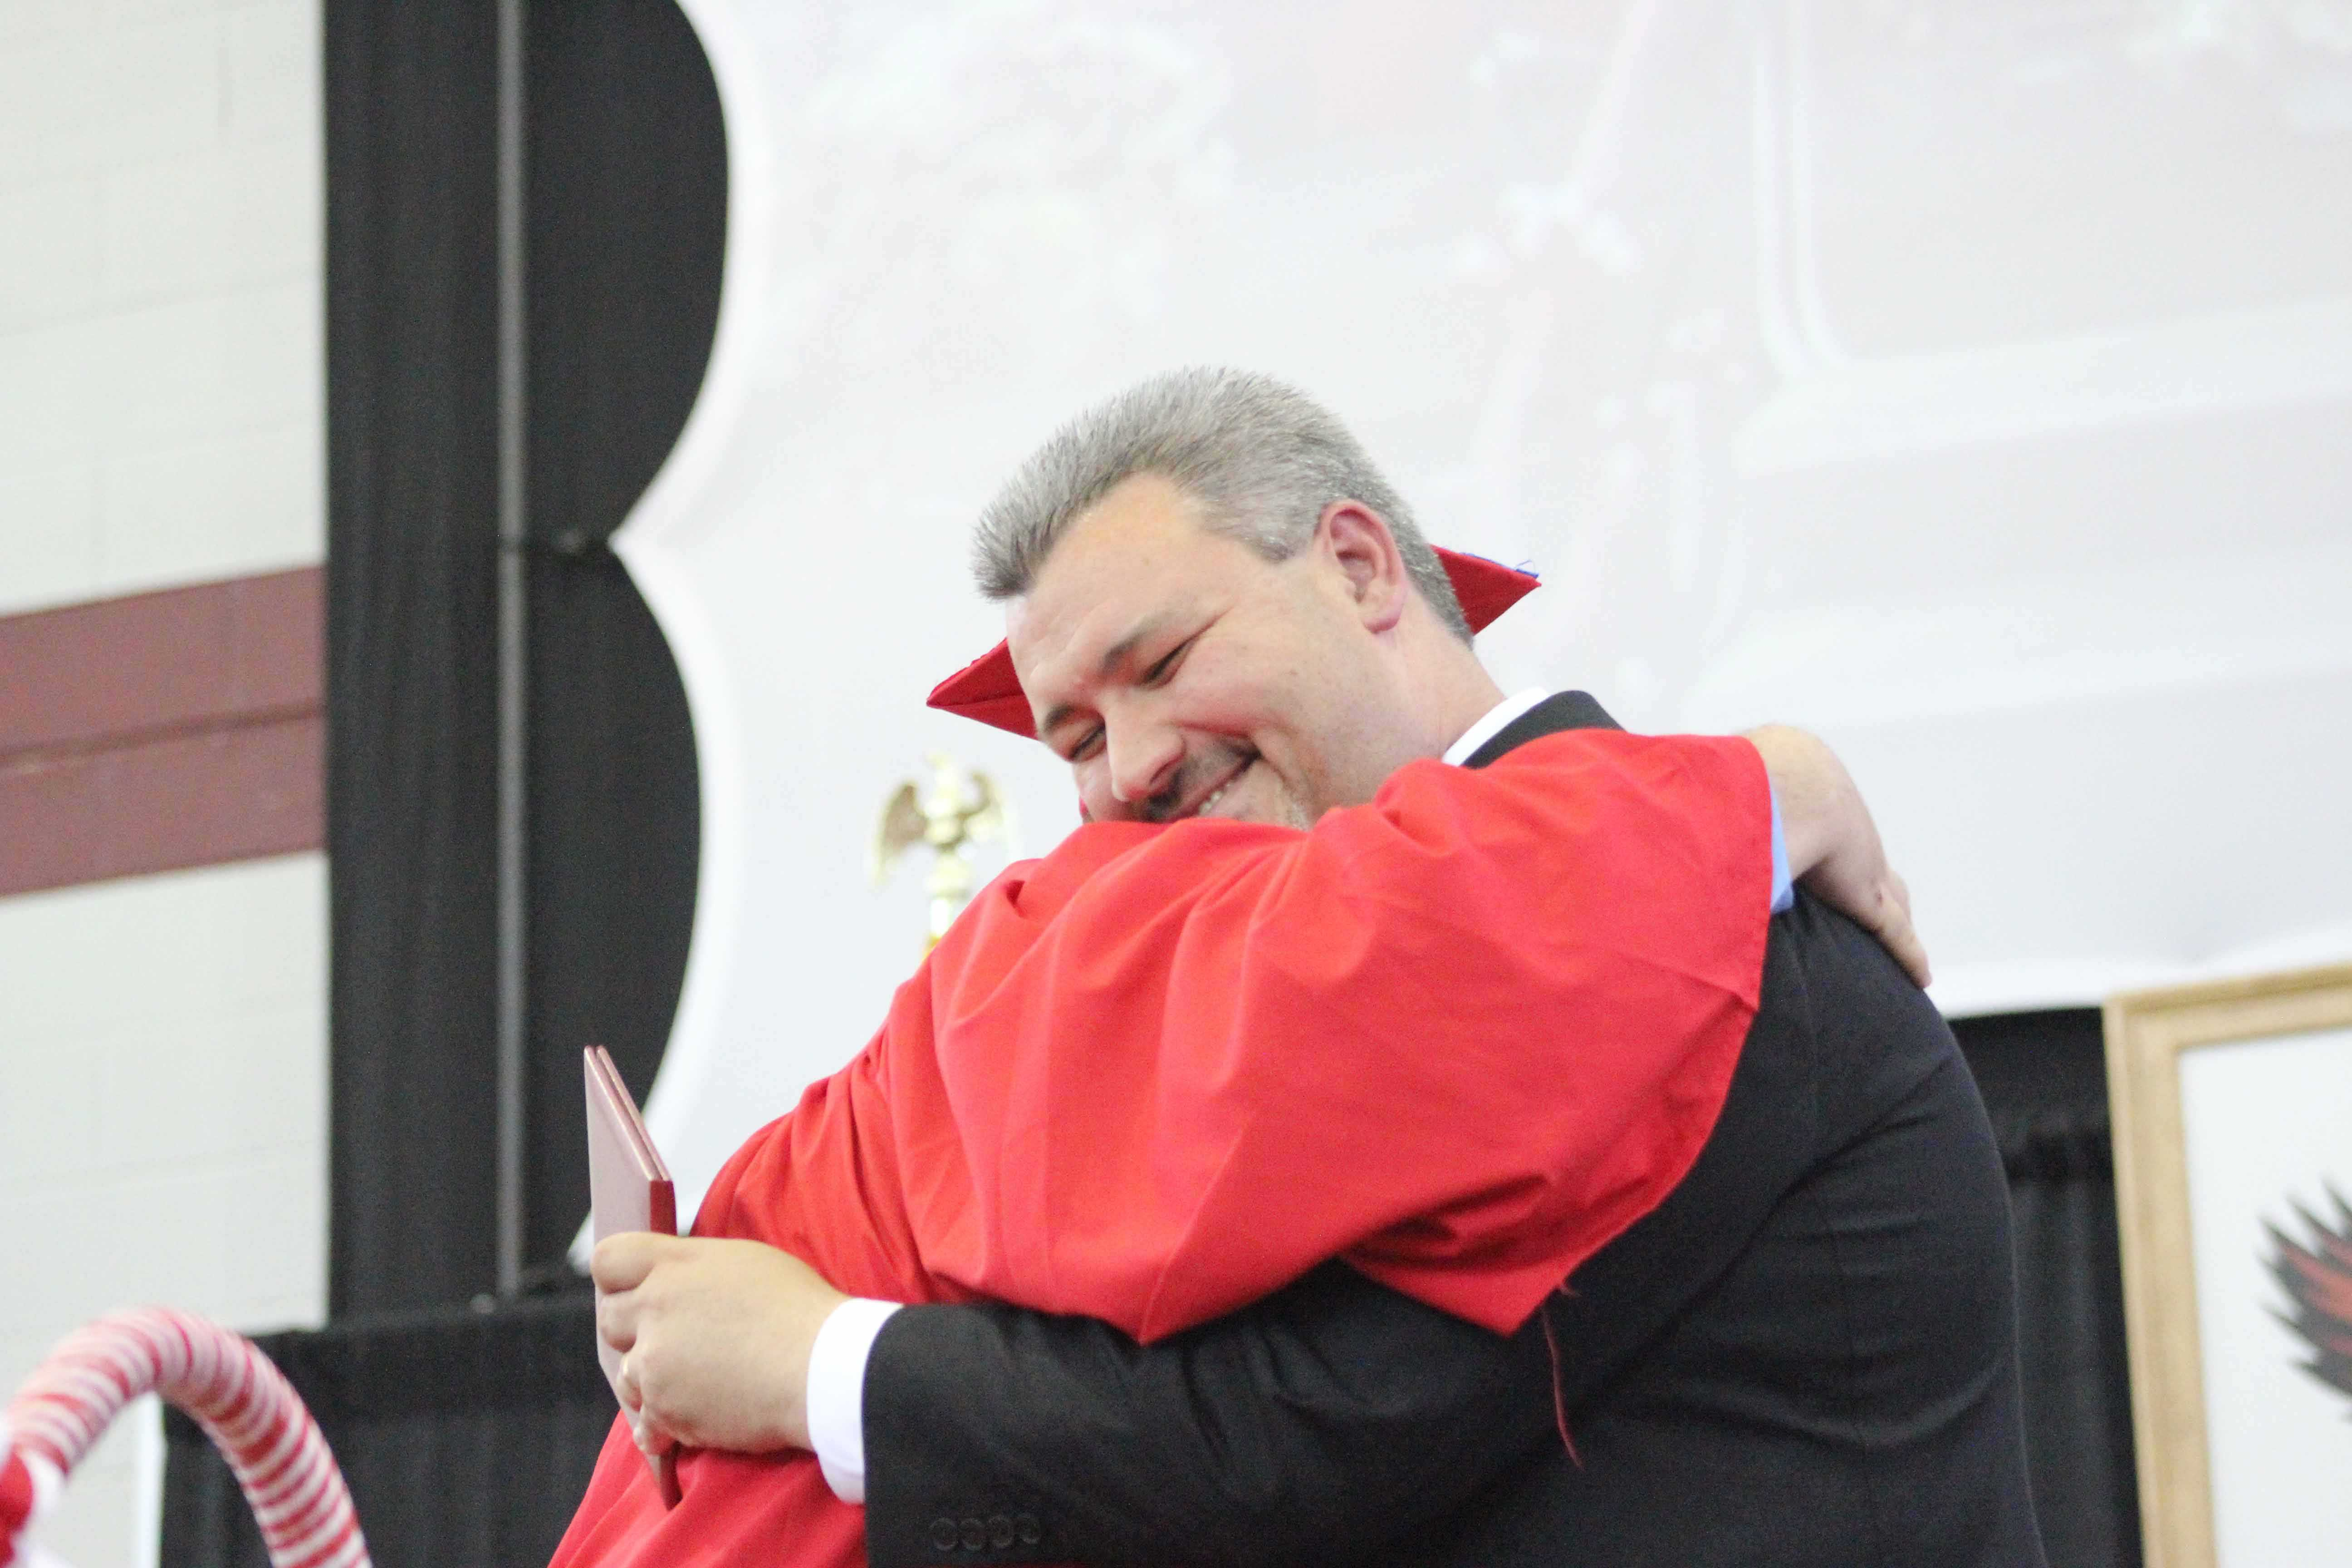 Jordan Bushey gives Principal Reagan a hug instead of a handshake.  |by Ally Jensen